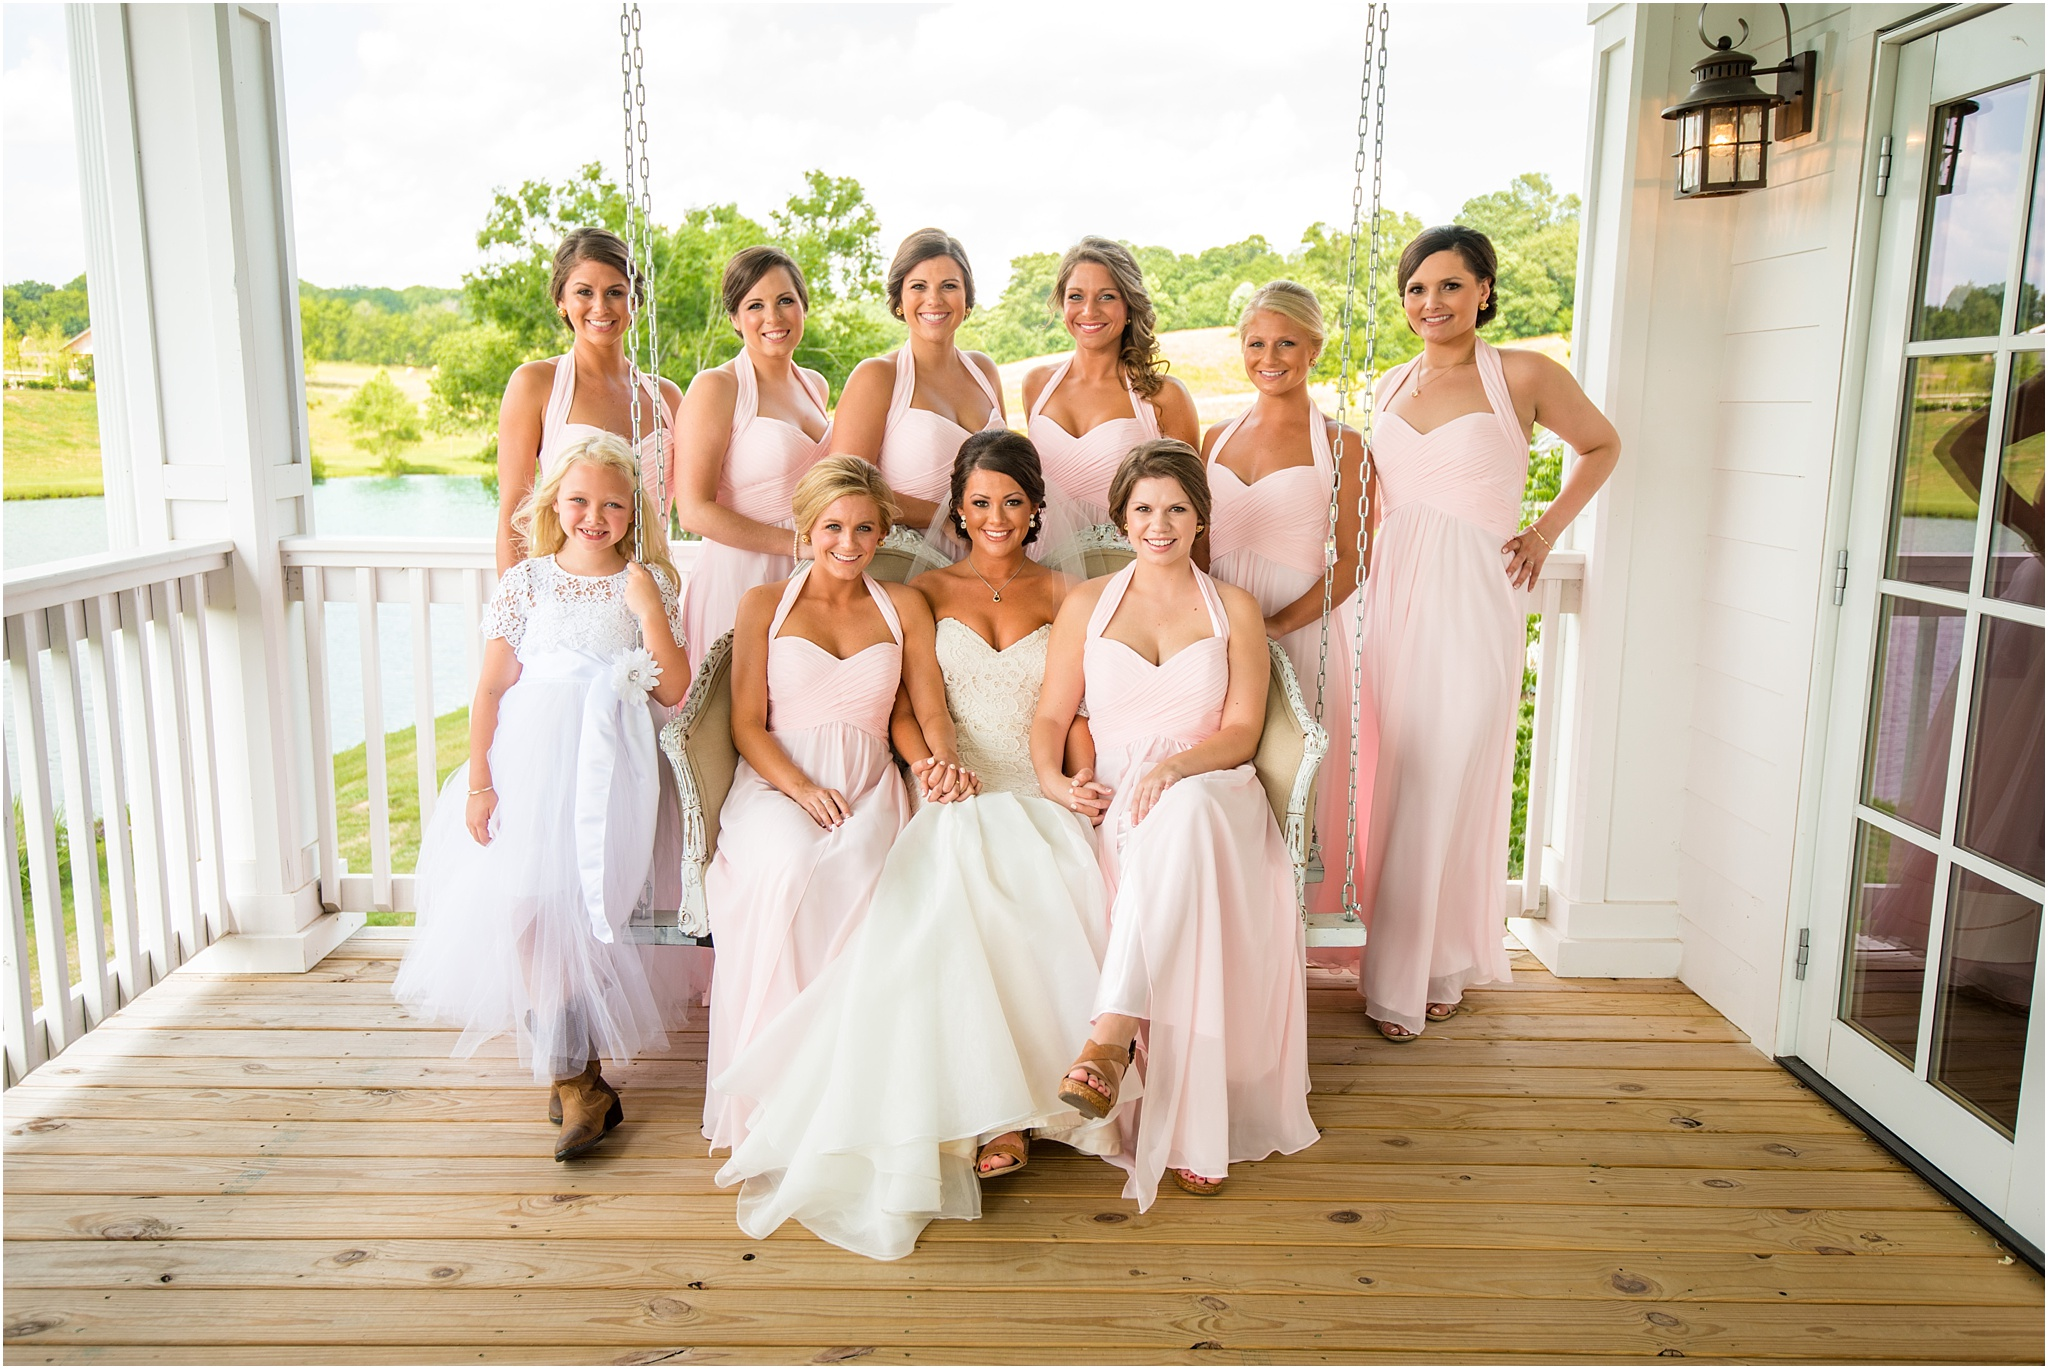 Greg Smit Photography Nashville wedding photographer Mint Springs Farm 6